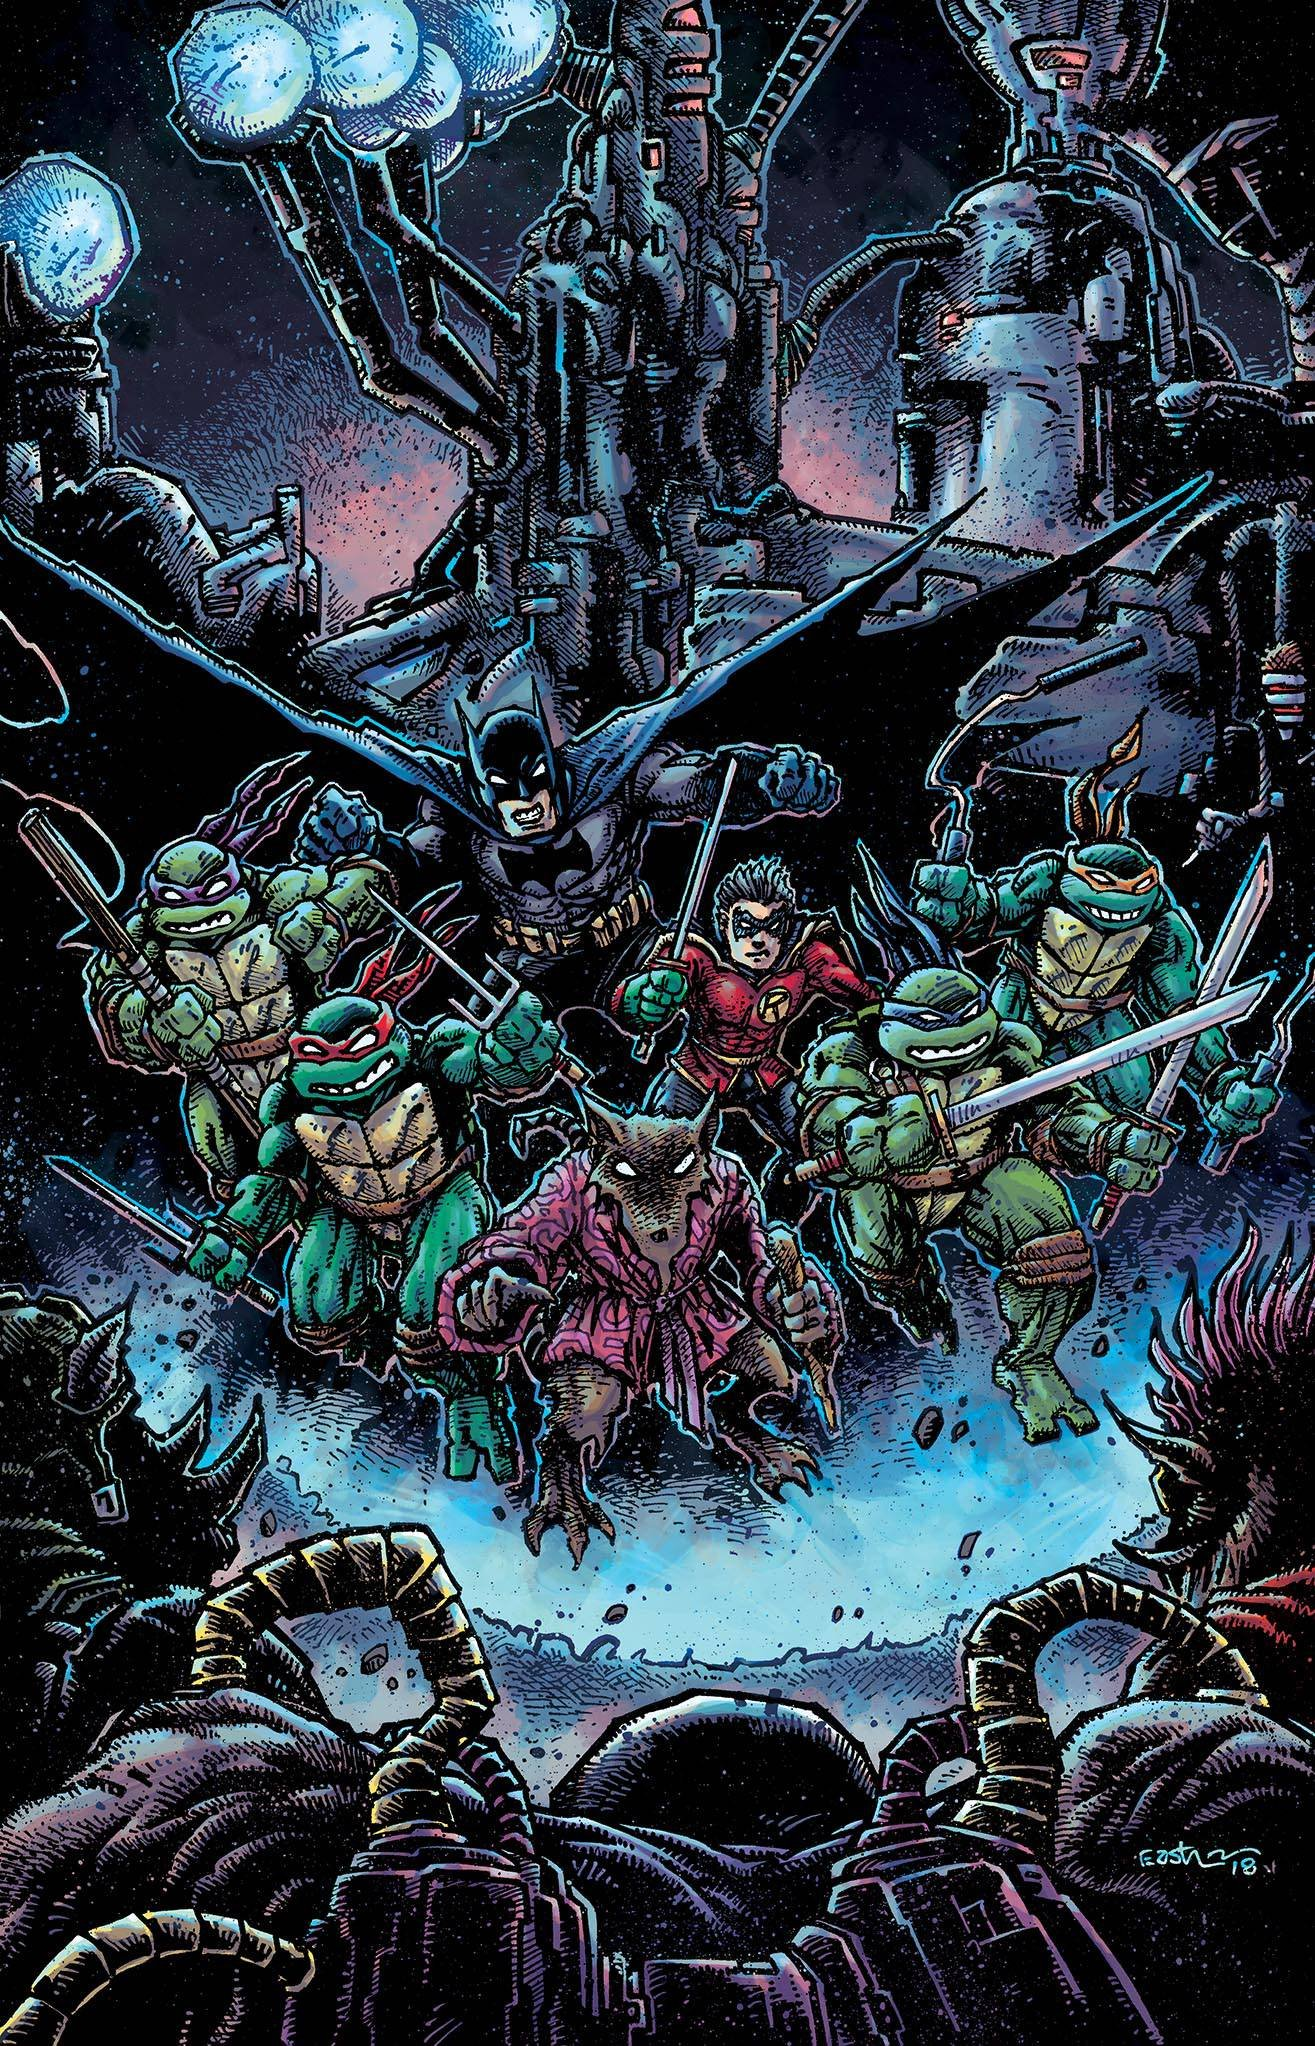 Batman Teenage Mutant Ninja Turtles Ii #4 (of 6): Amazon.com ...